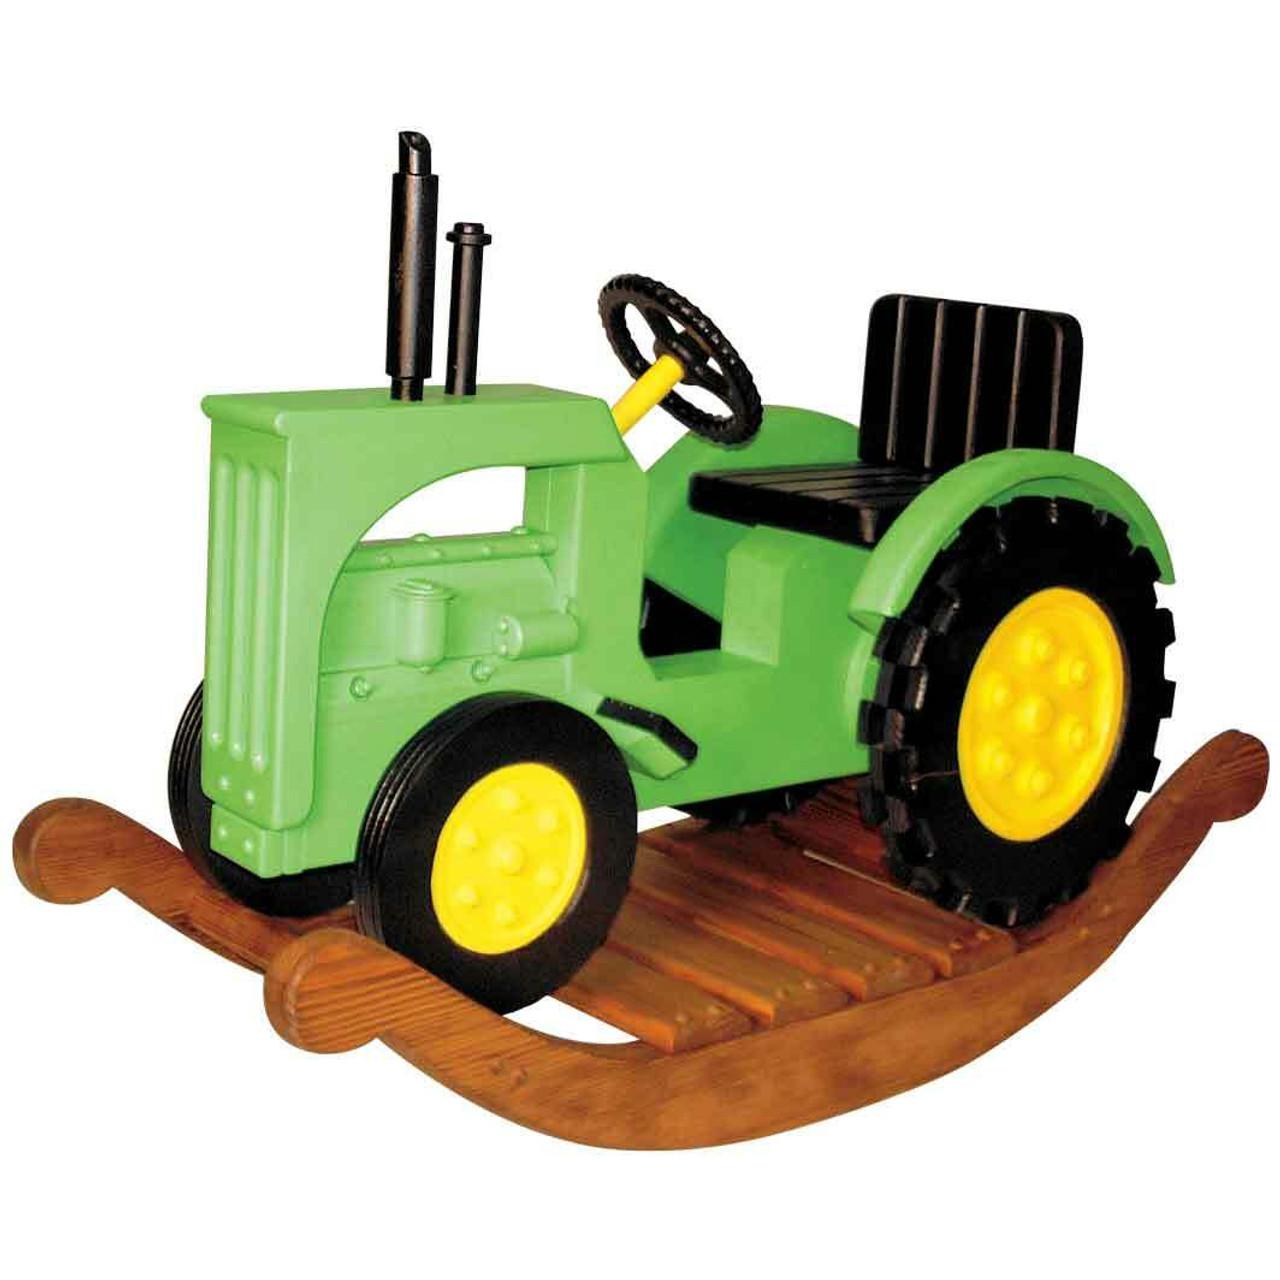 Cherry Tree Toys Rocking Tractor Plan